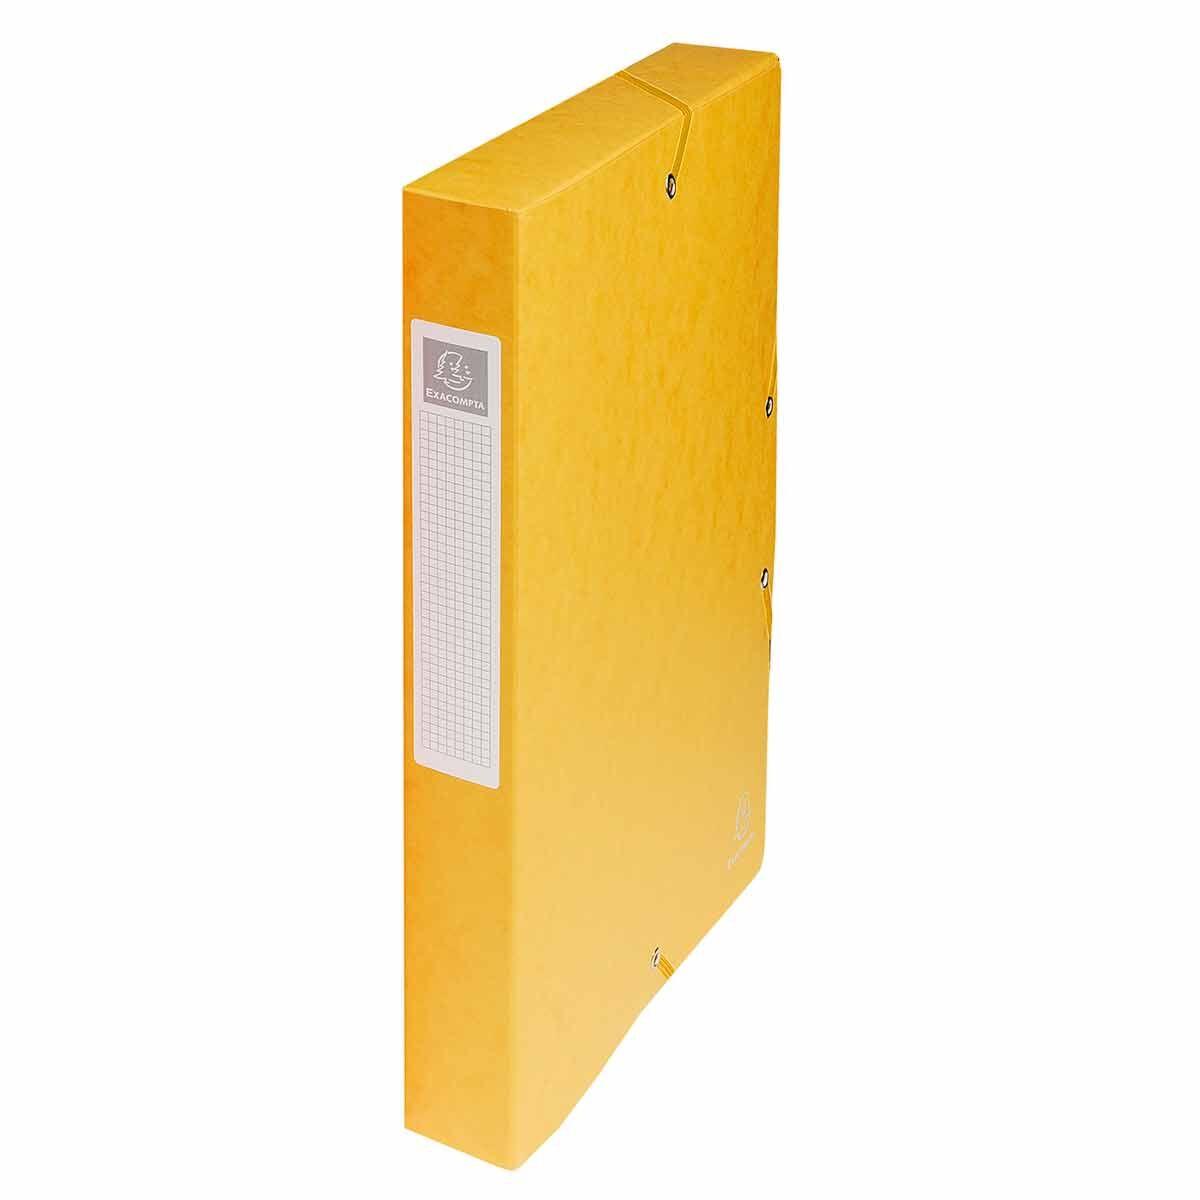 Exacompta Elasticated Box File Pressboard A4 40mm Pack of 8 Yellow